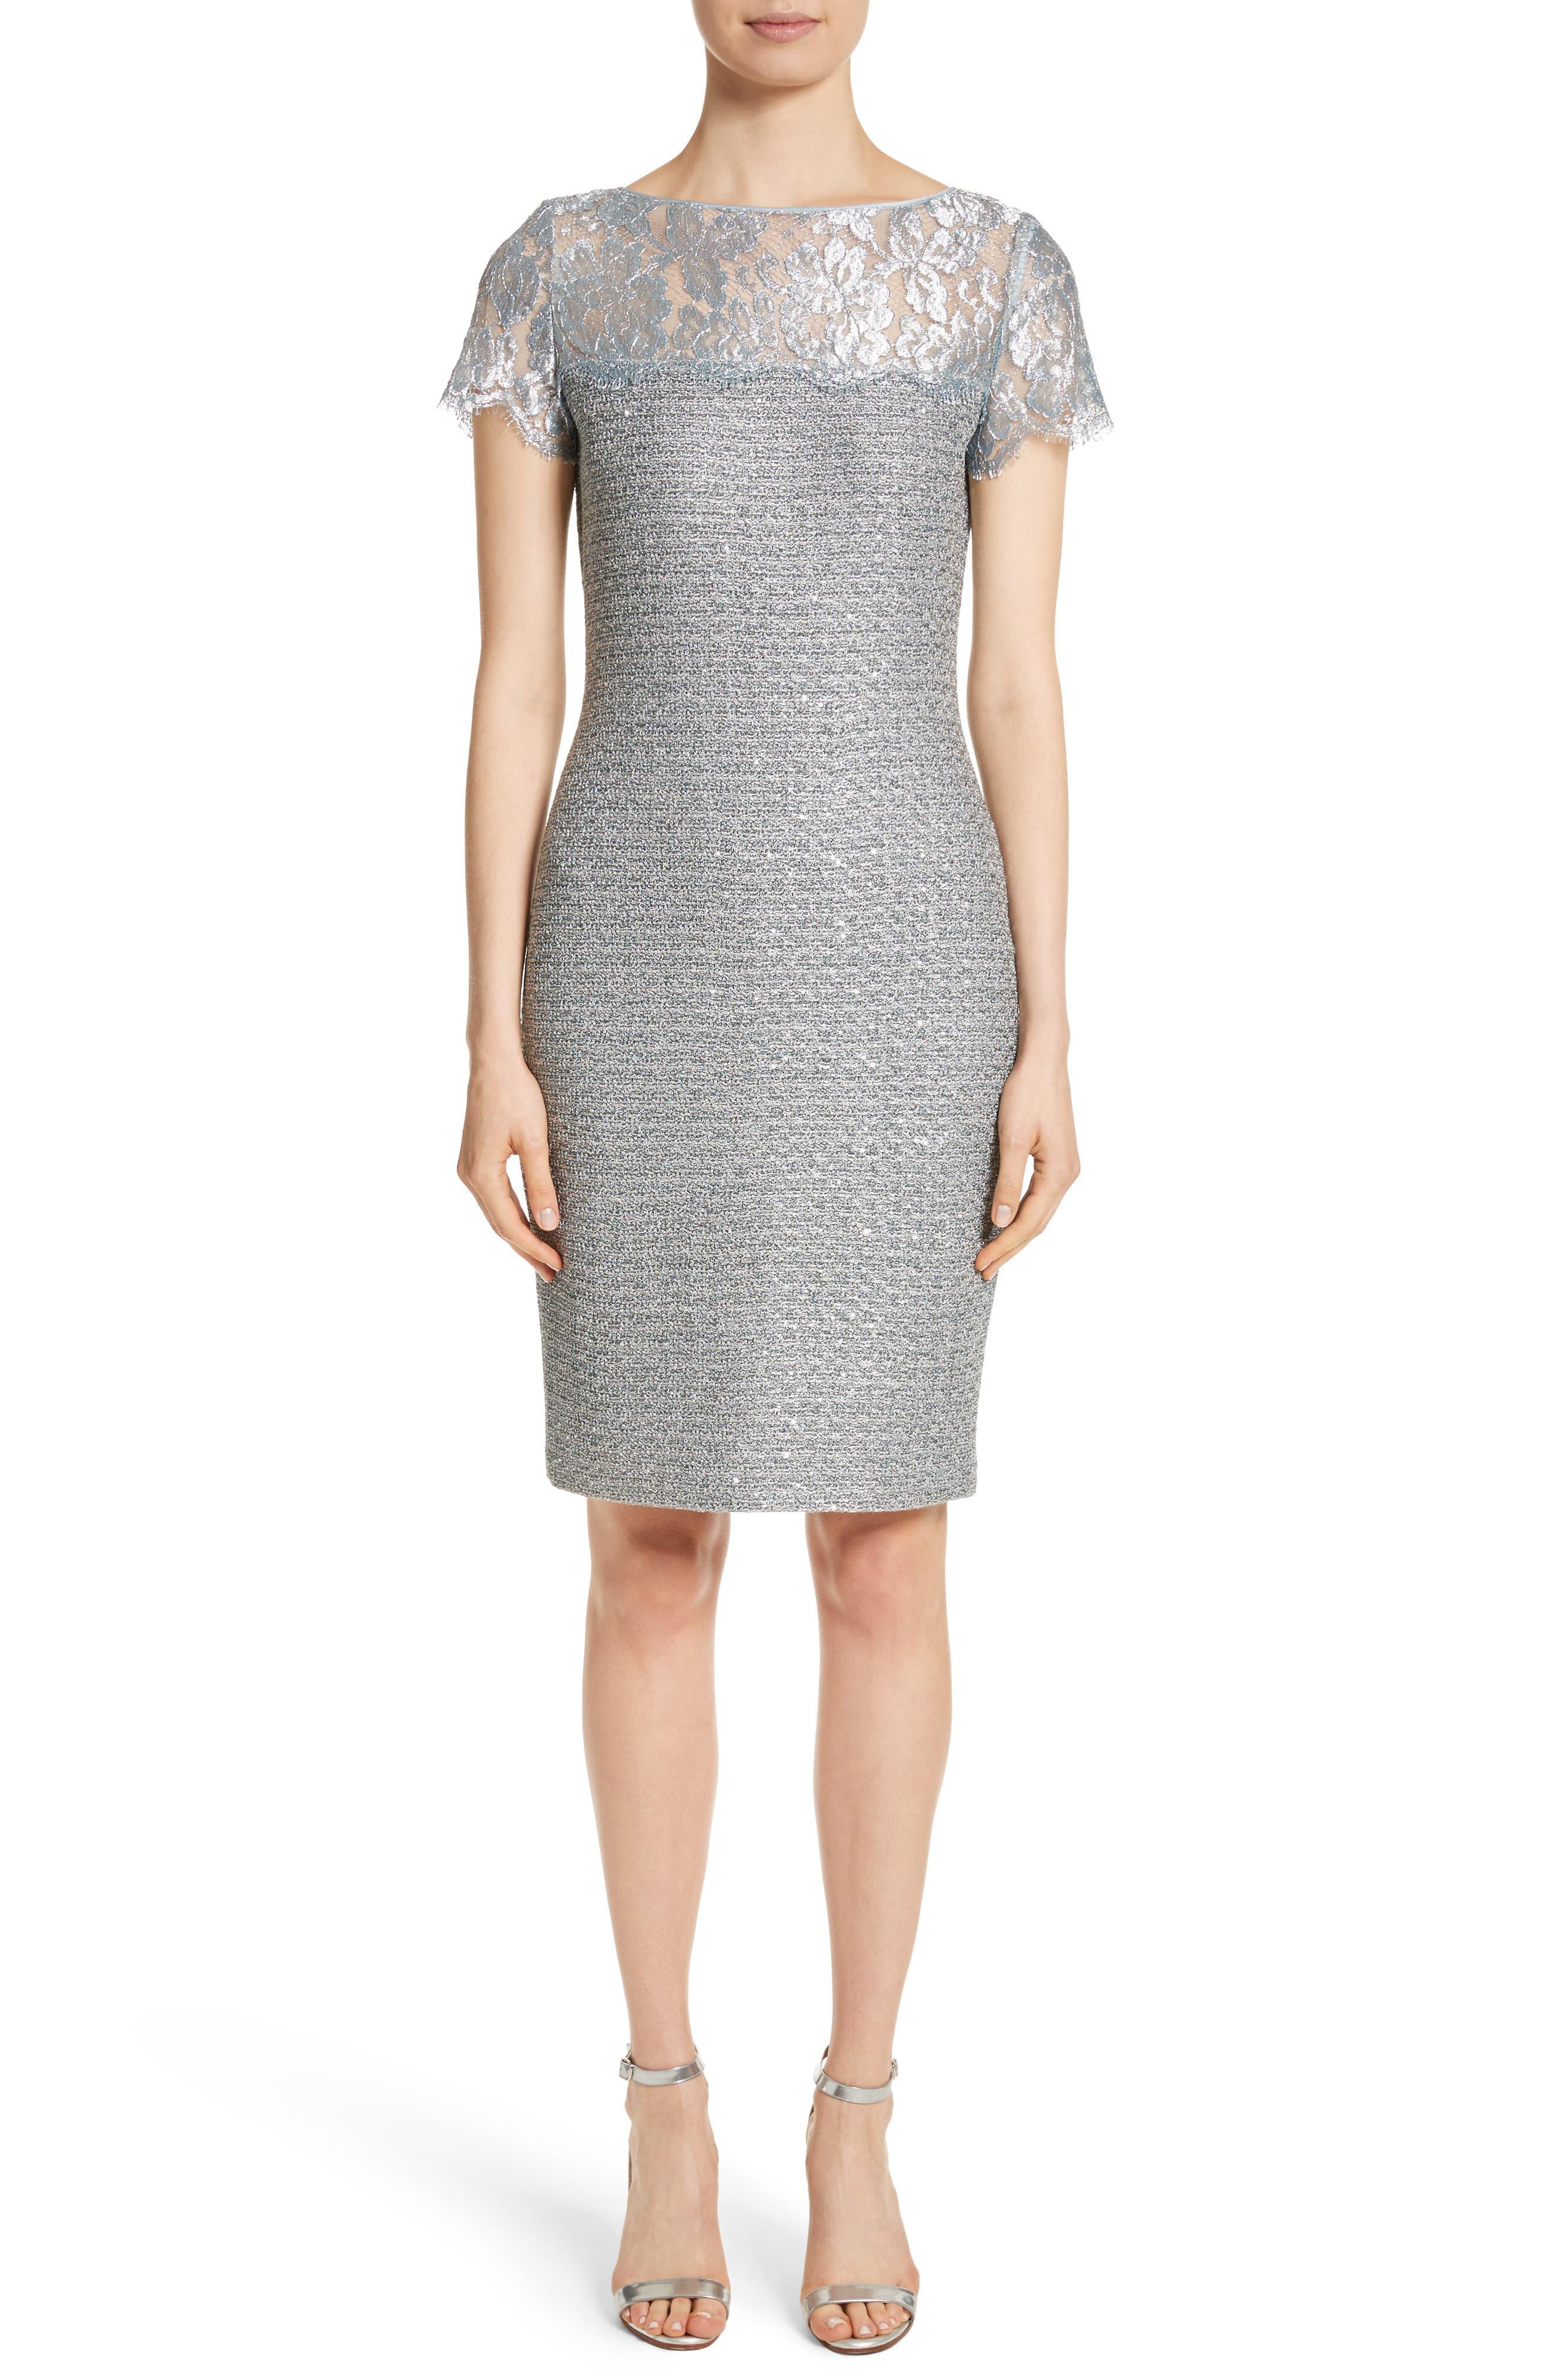 Main Image - St. John Collection Metallic Sequin Knit Dress